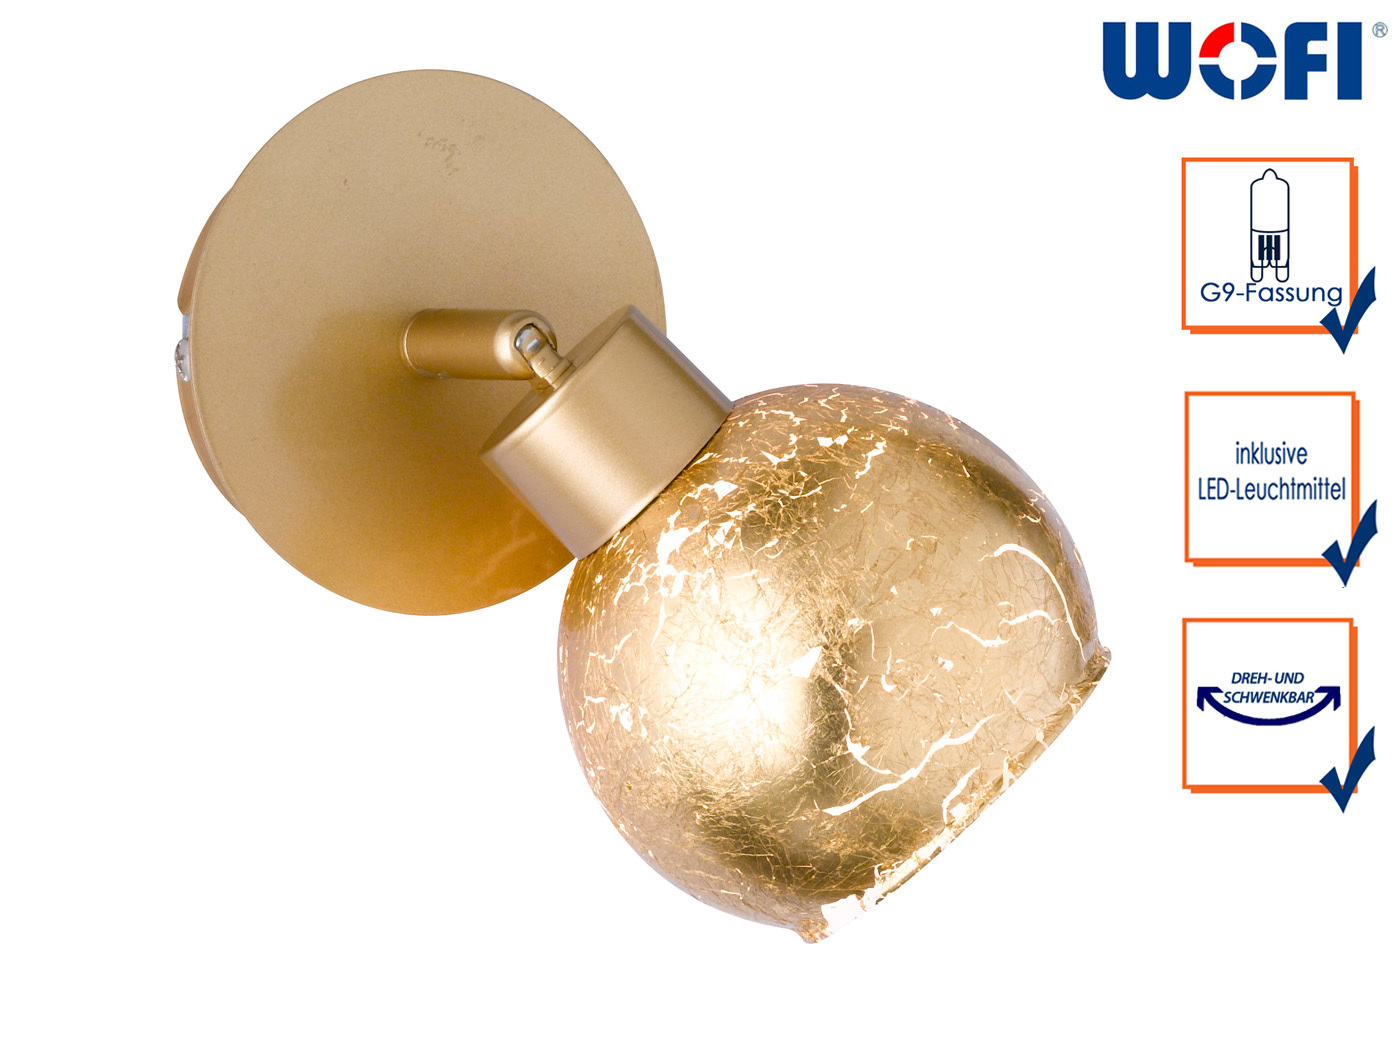 LED Wandleuchte Spot drehbar Goldfarbig G9, Wandleuchte Wohnzimmer  Schlafzimmer